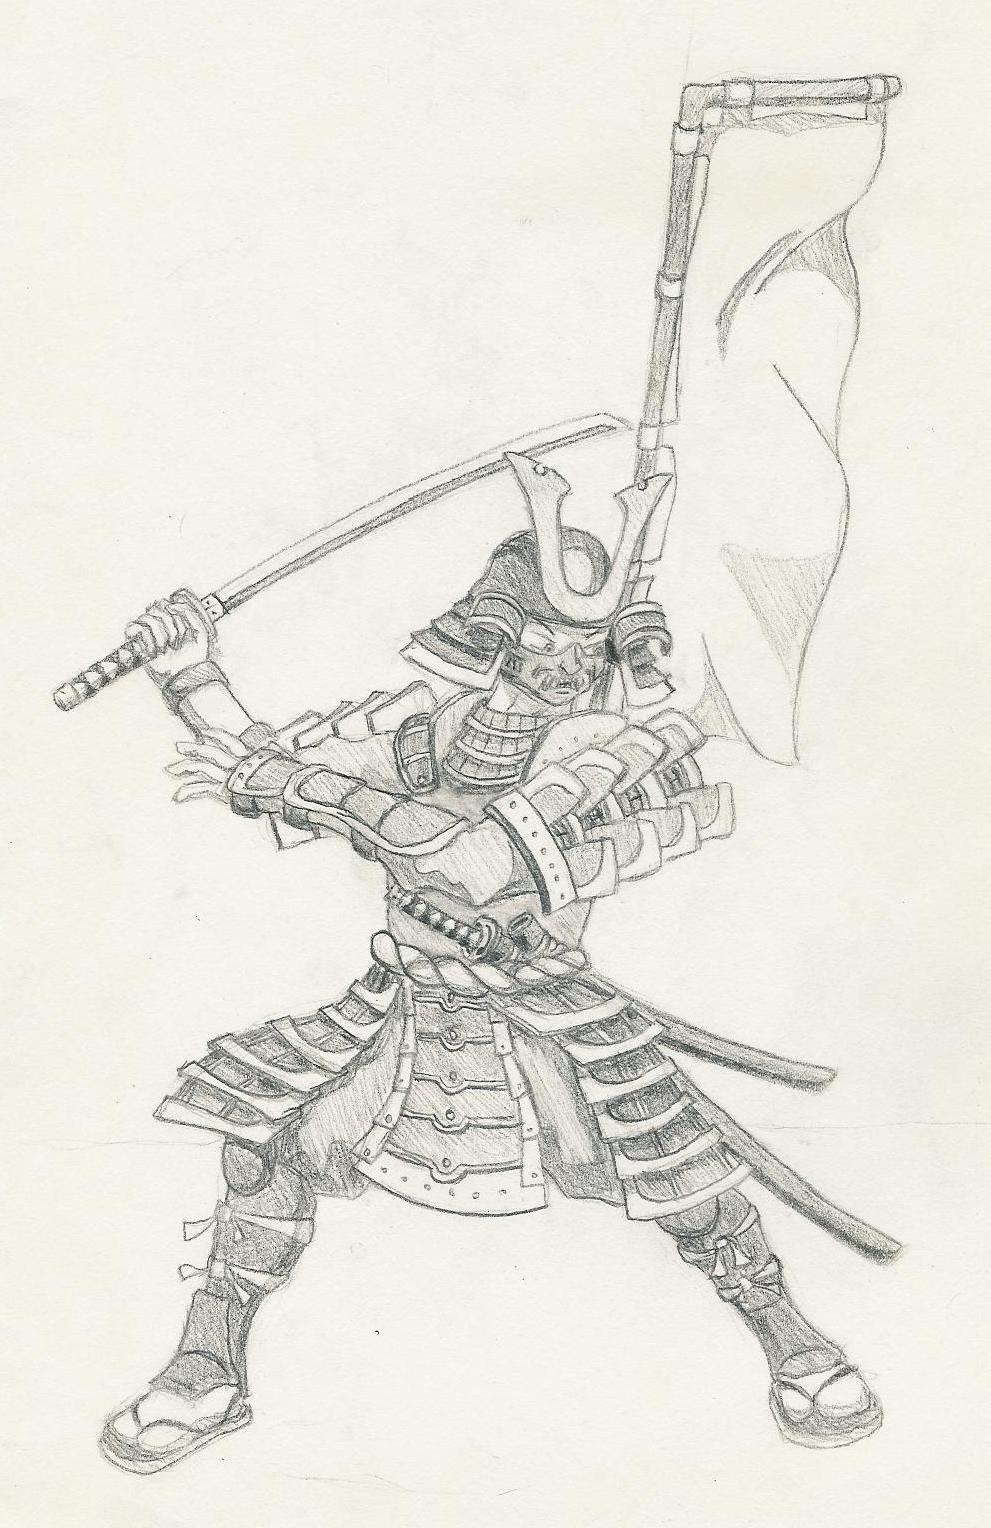 Drawn samurai samuri By Samurai Xhydralisk in Action